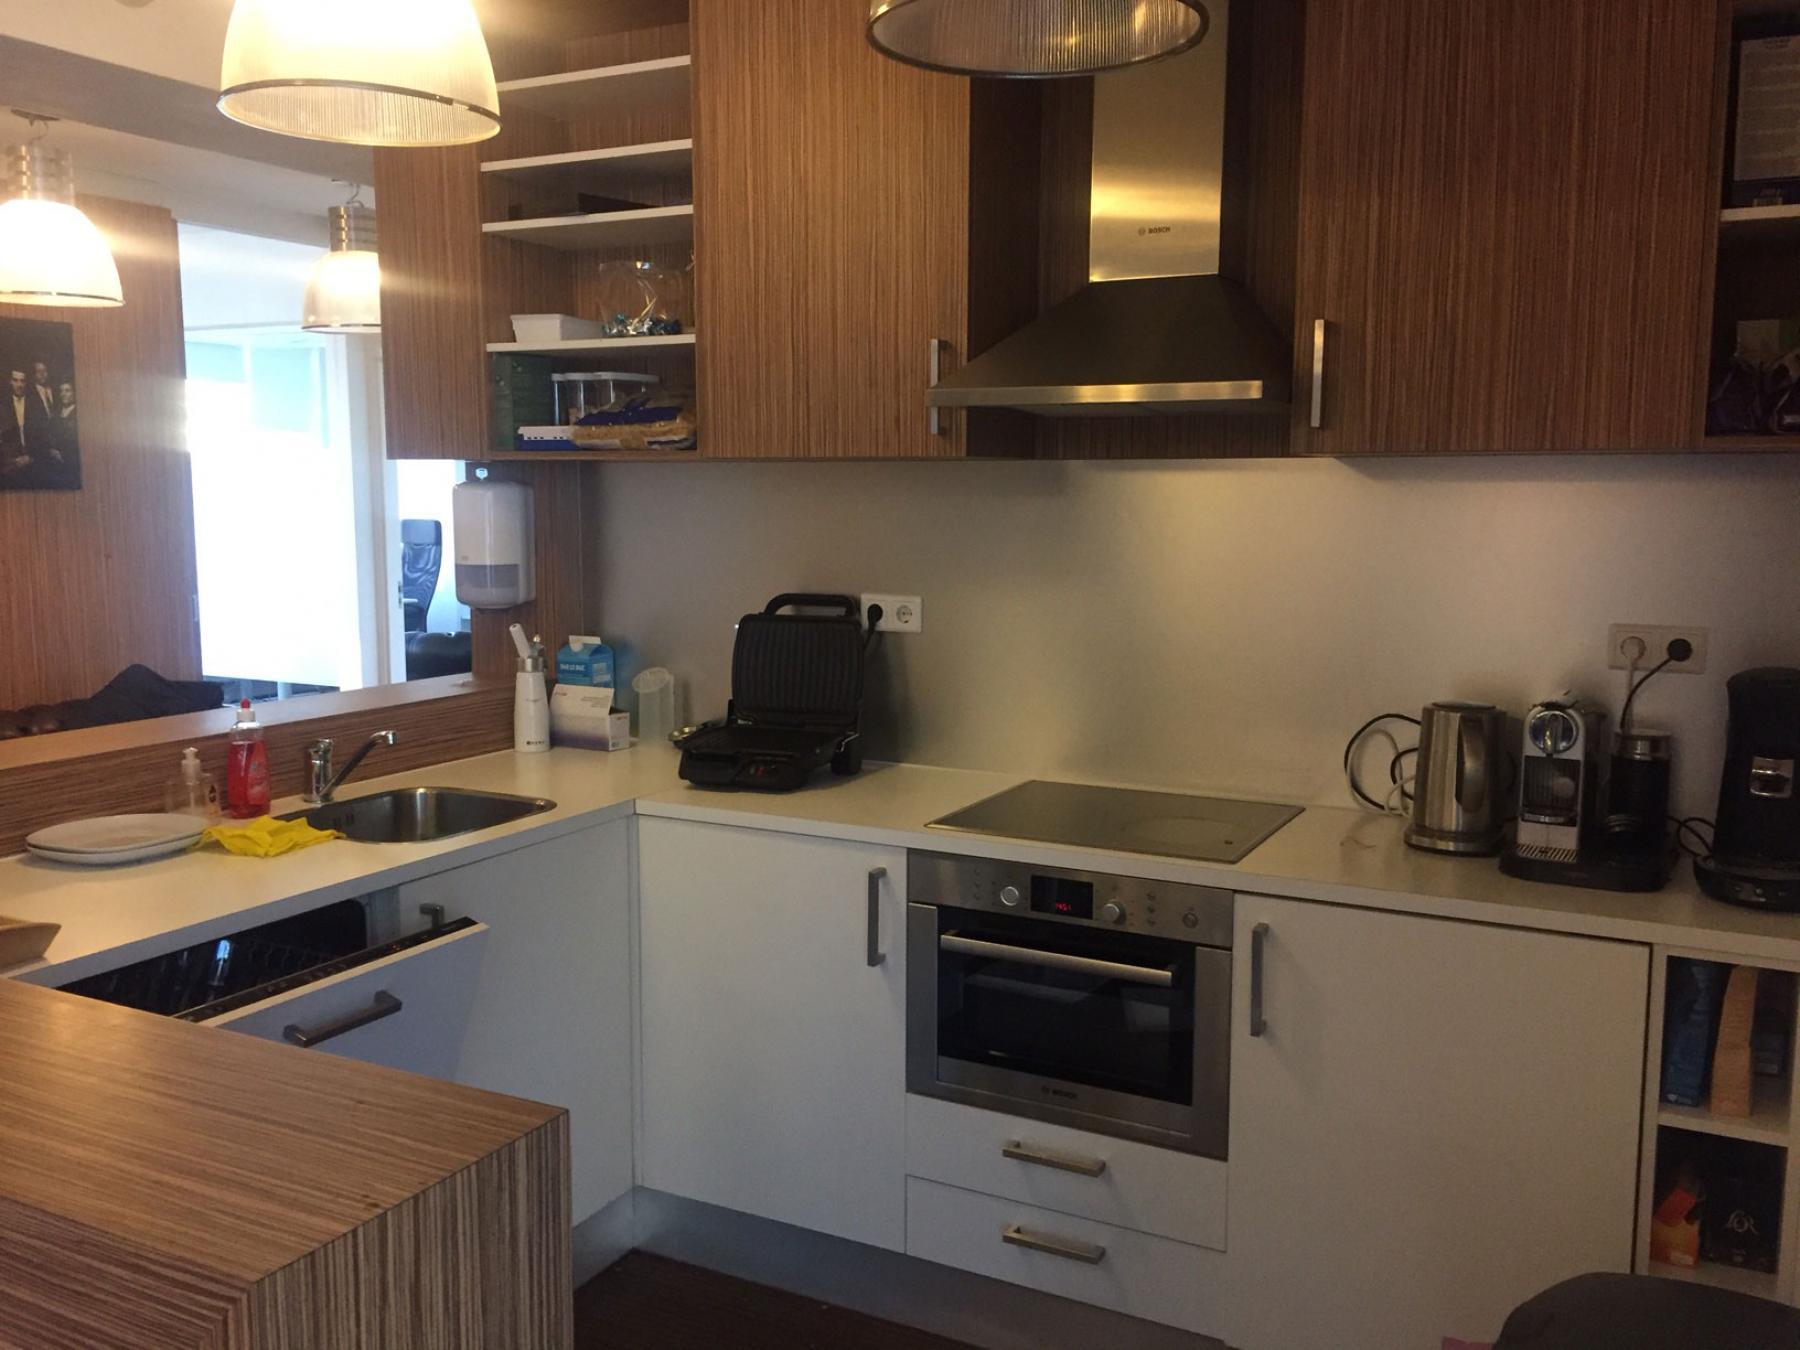 keuken met apparatuur Rotterdam Walenburgerweg